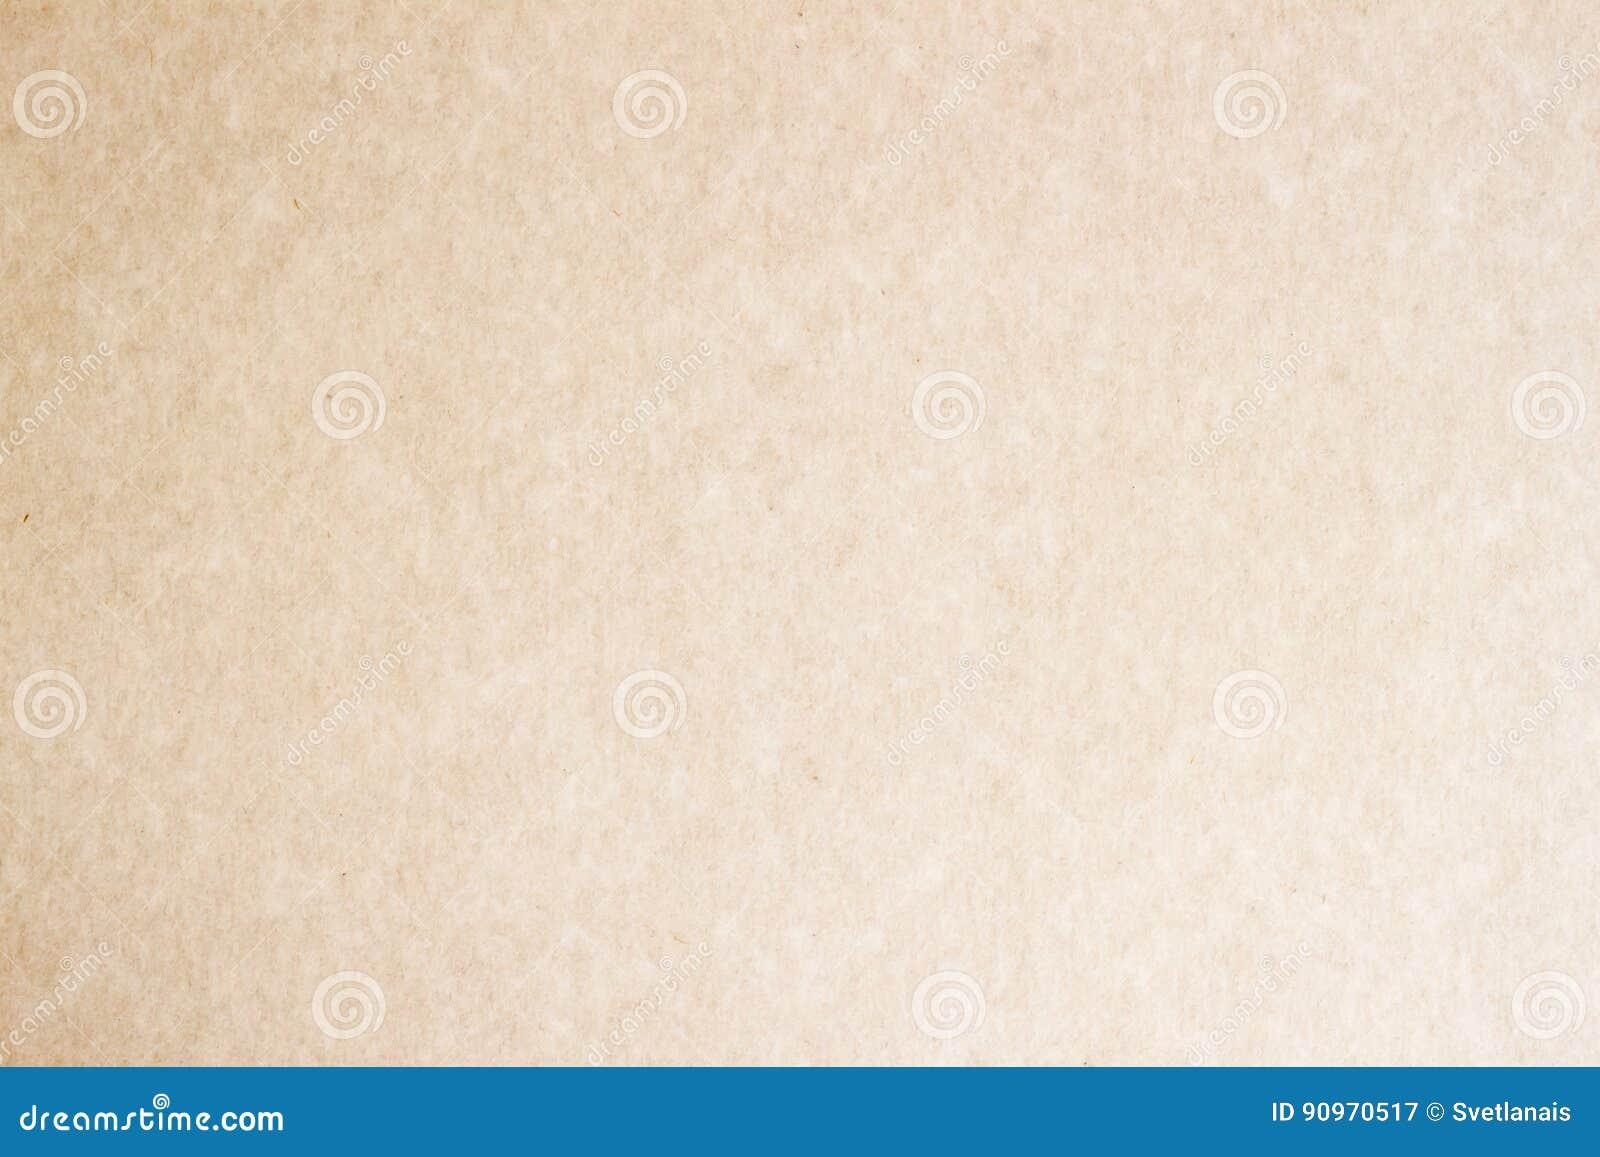 Paper Craft Texture. Grunge Surface, Organic Cardboard ...